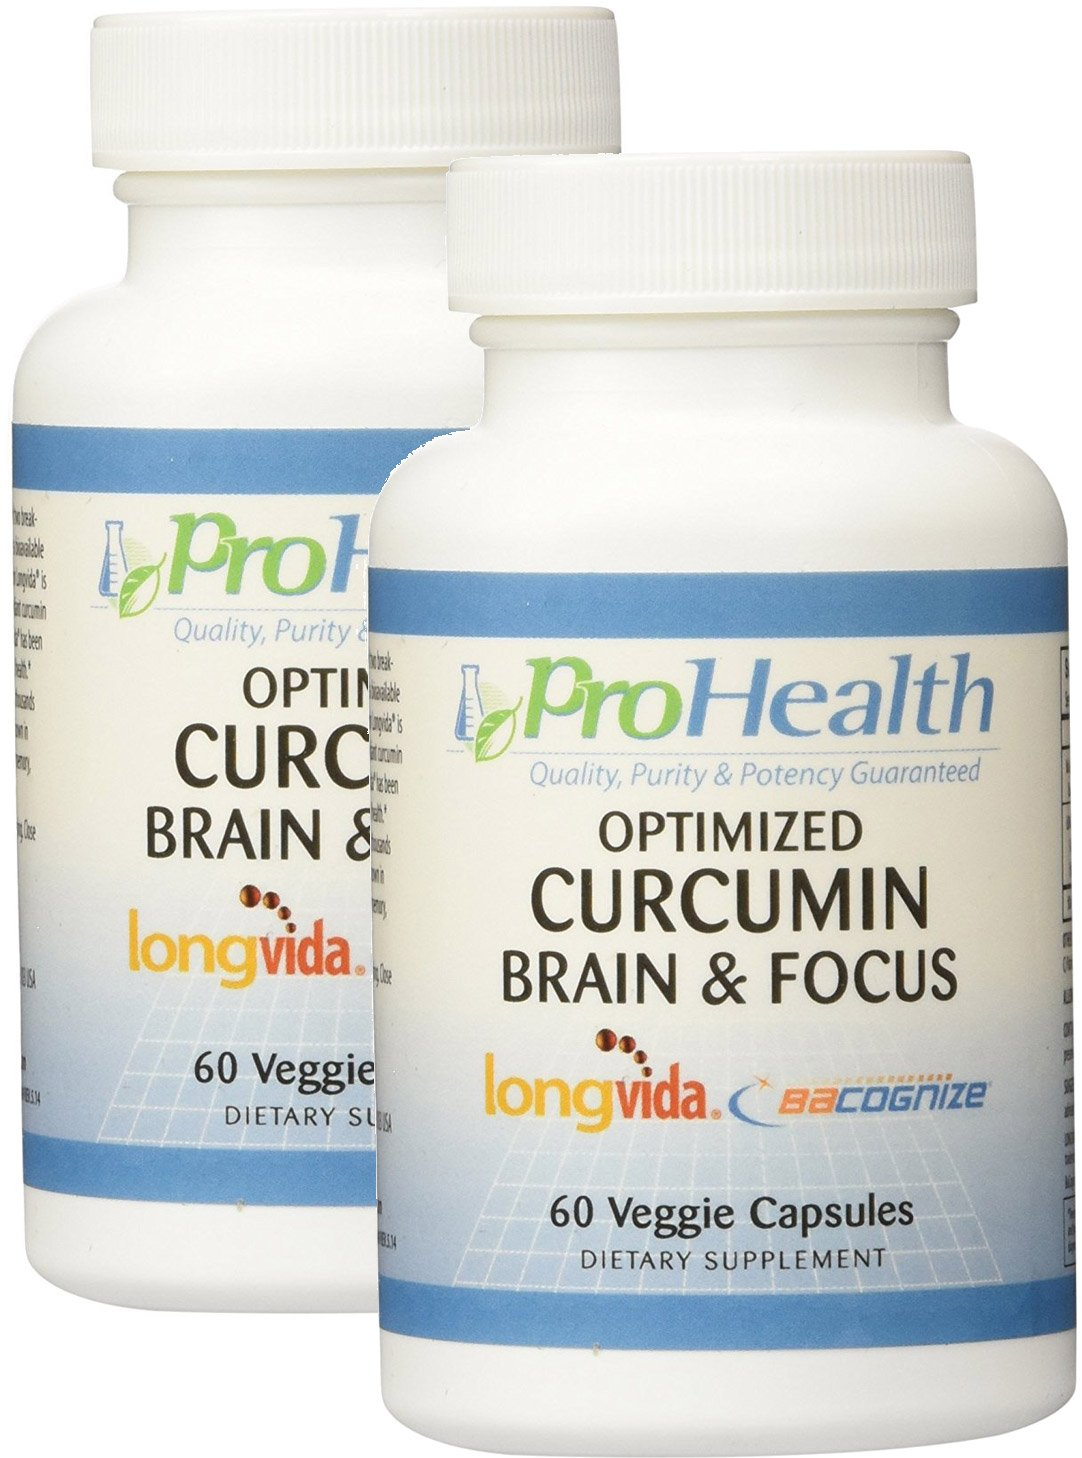 2-Pack Brain & Focus - Optimized Curcumin Longvida with BaCognize Bacopa Monnieri by ProHealth (60 veggie capsules)